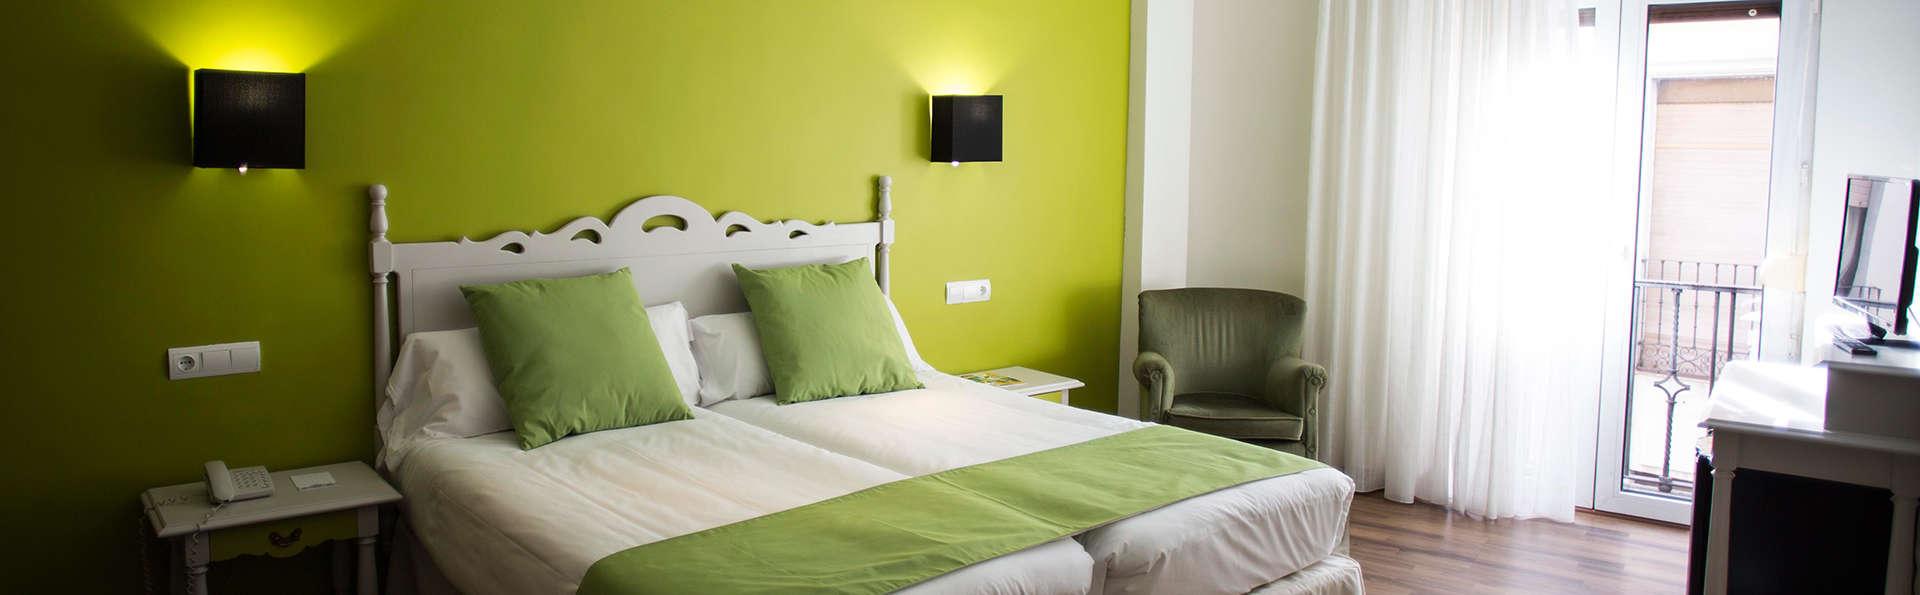 Hotel Palacio Valderrábanos  - EDIT_room3.jpg